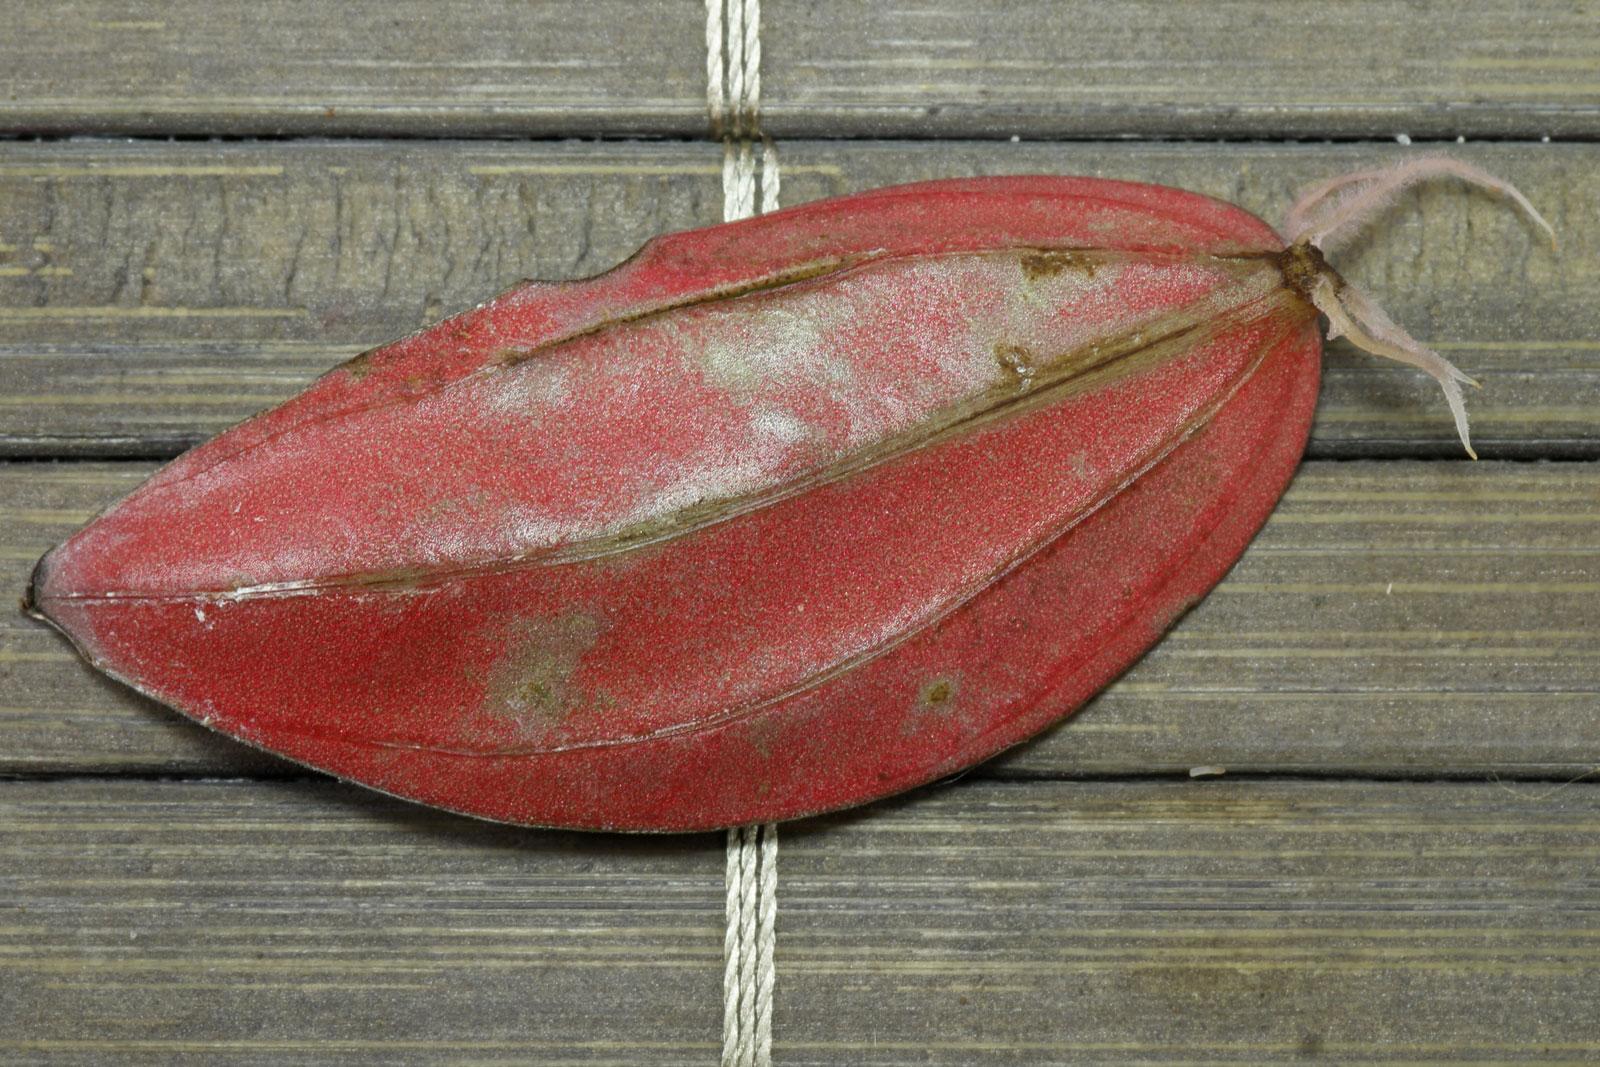 Peperomia-Blattsteckling